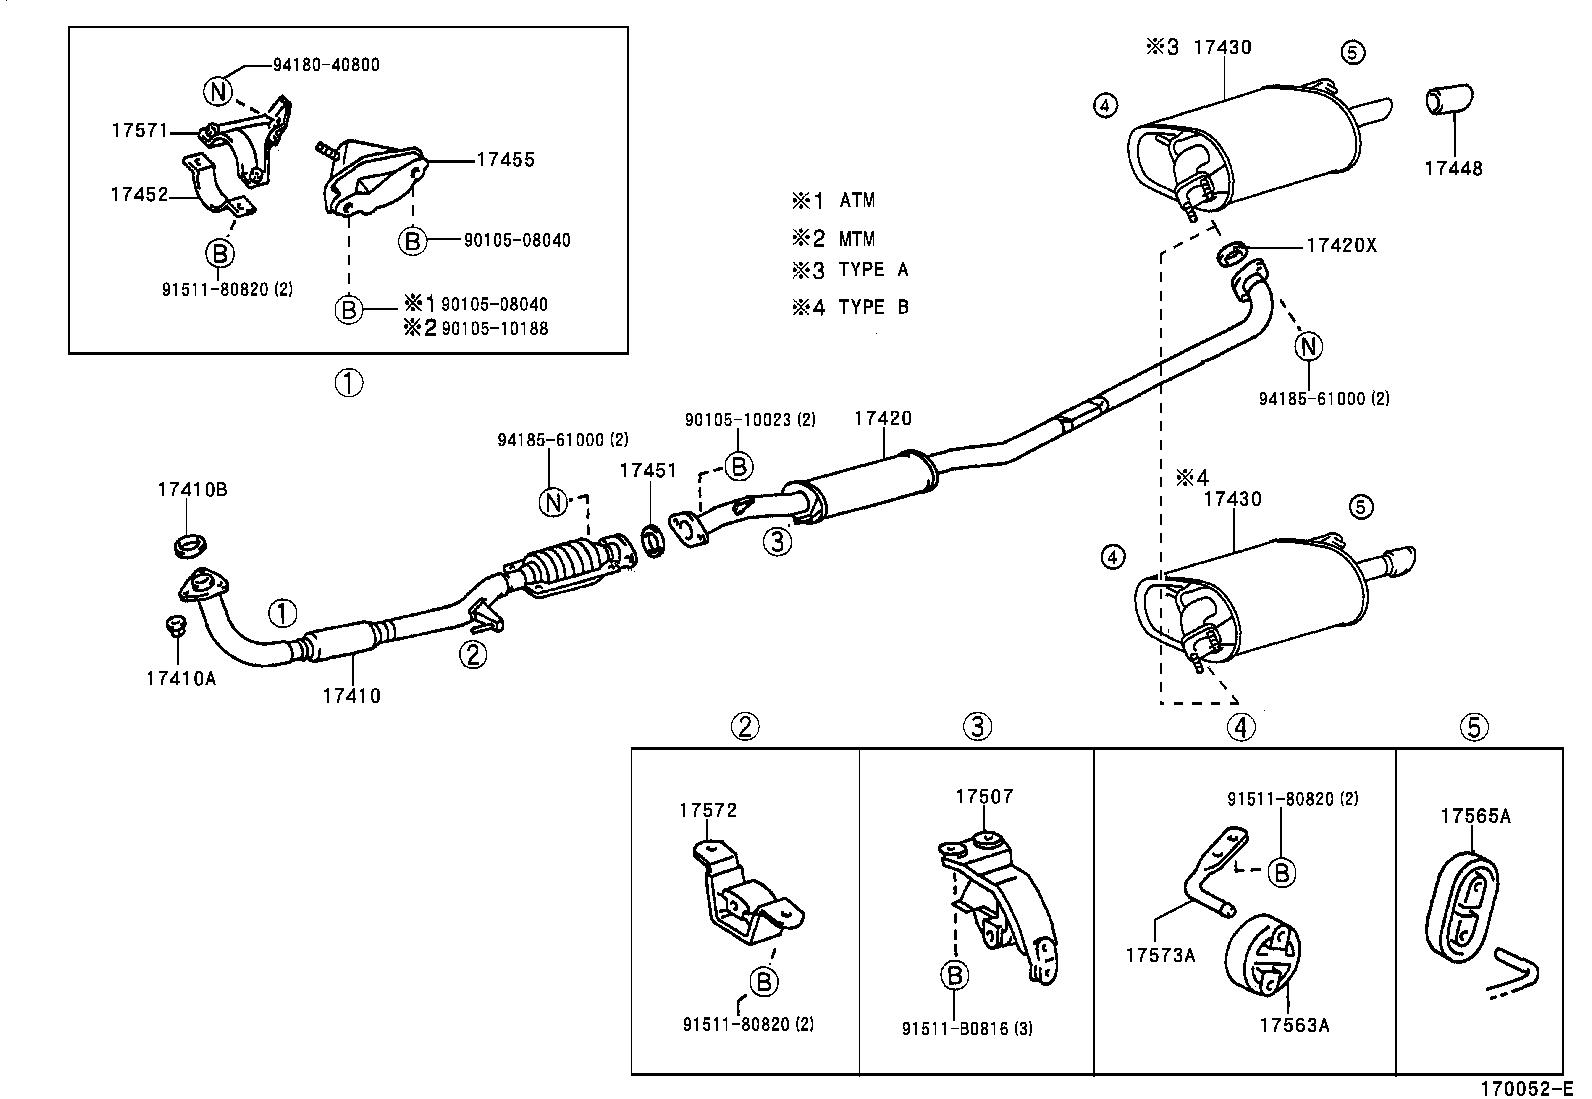 hight resolution of 1987 toyota 4runner fuse box imageresizertool com 99 camry 94 camry